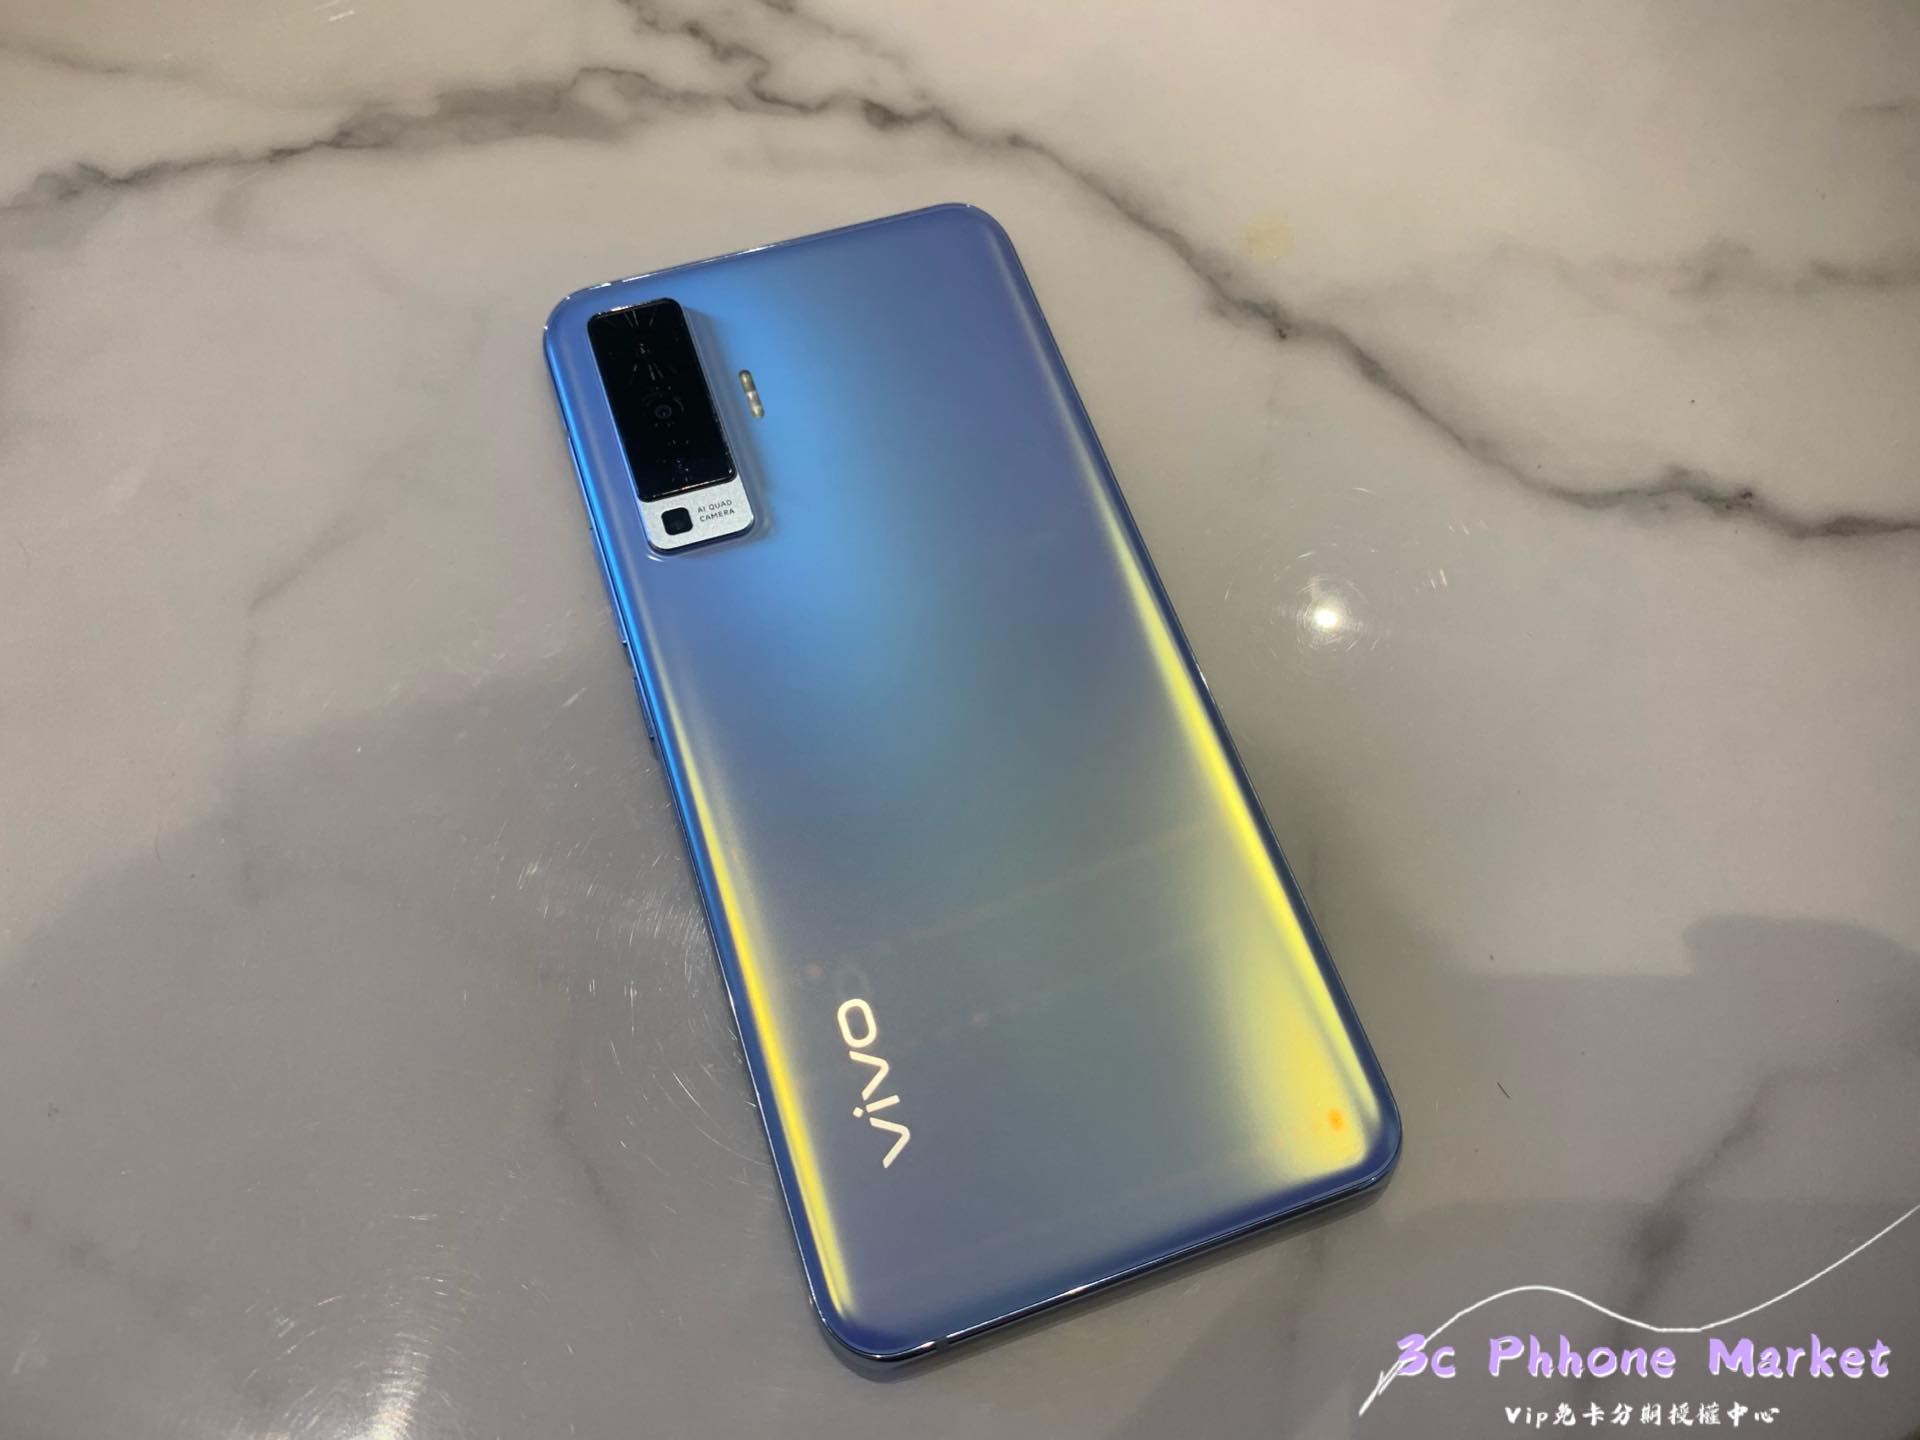 VIVO X50 霜花藍色實拍